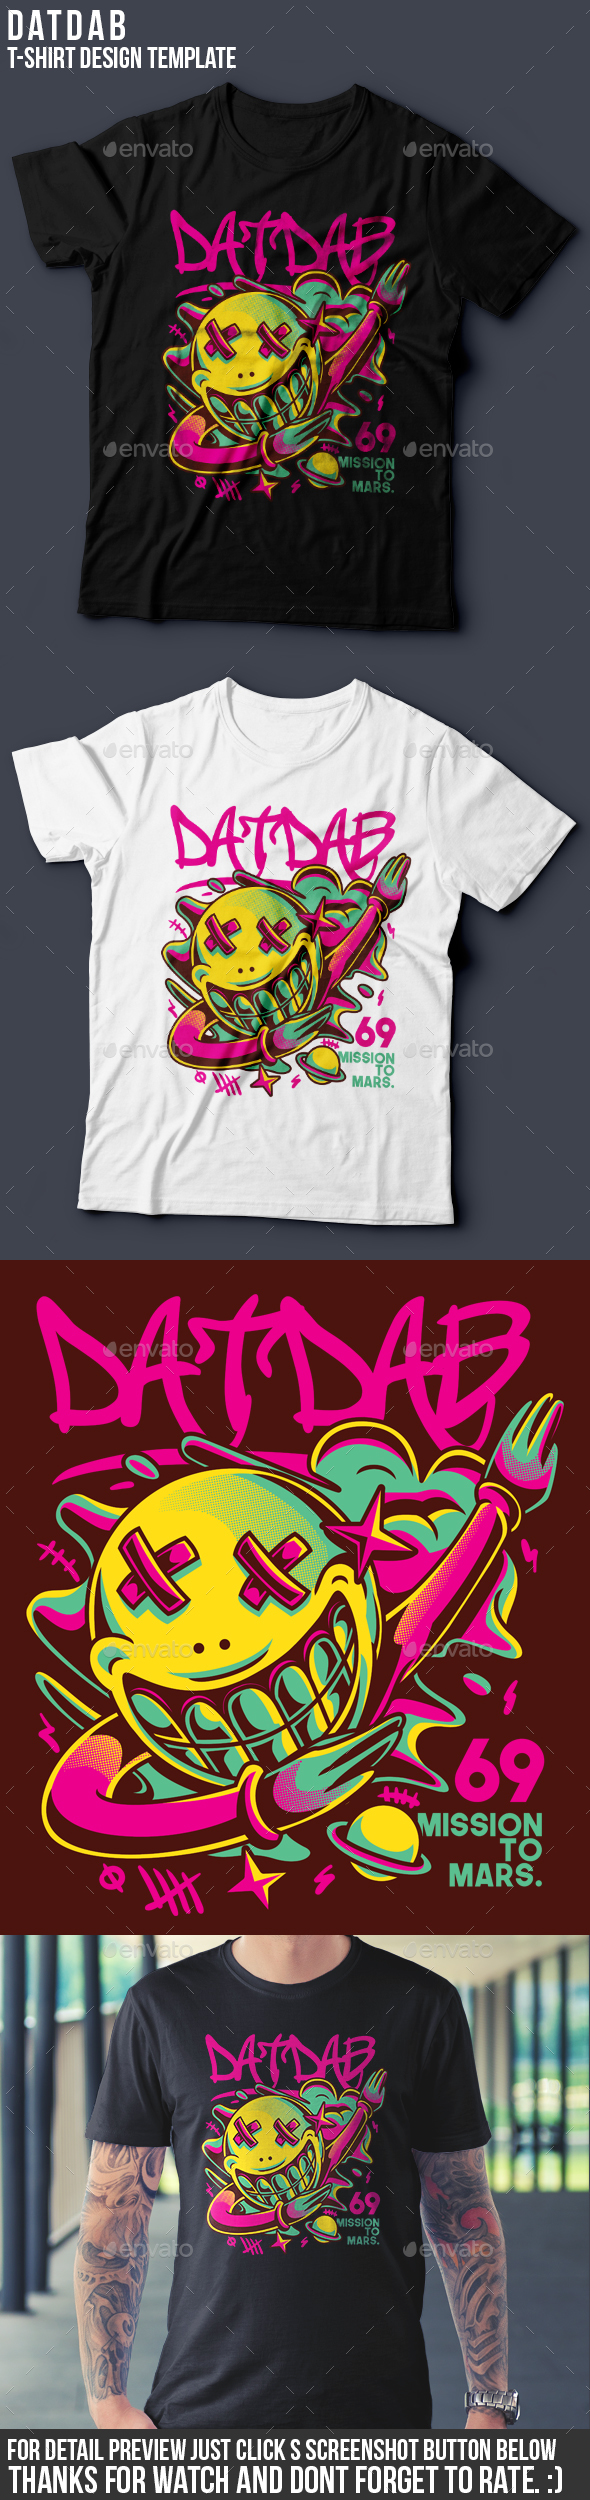 Dat Dab T-Shirt Design - Events T-Shirts